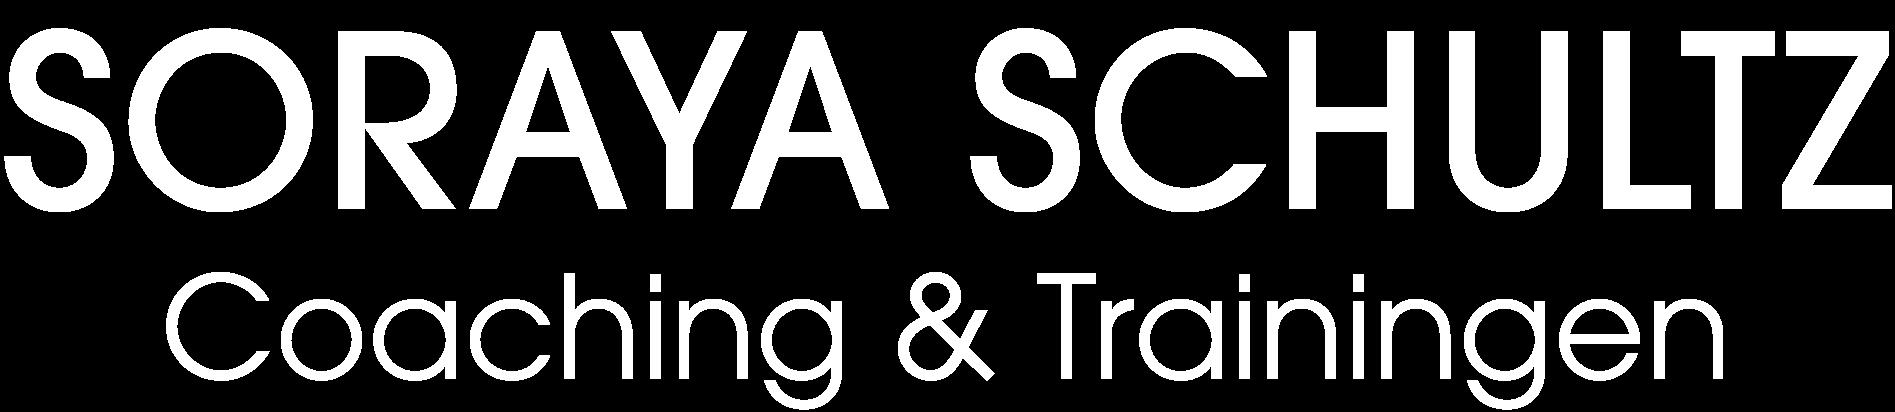 Life Coach Soraya Schultz logo